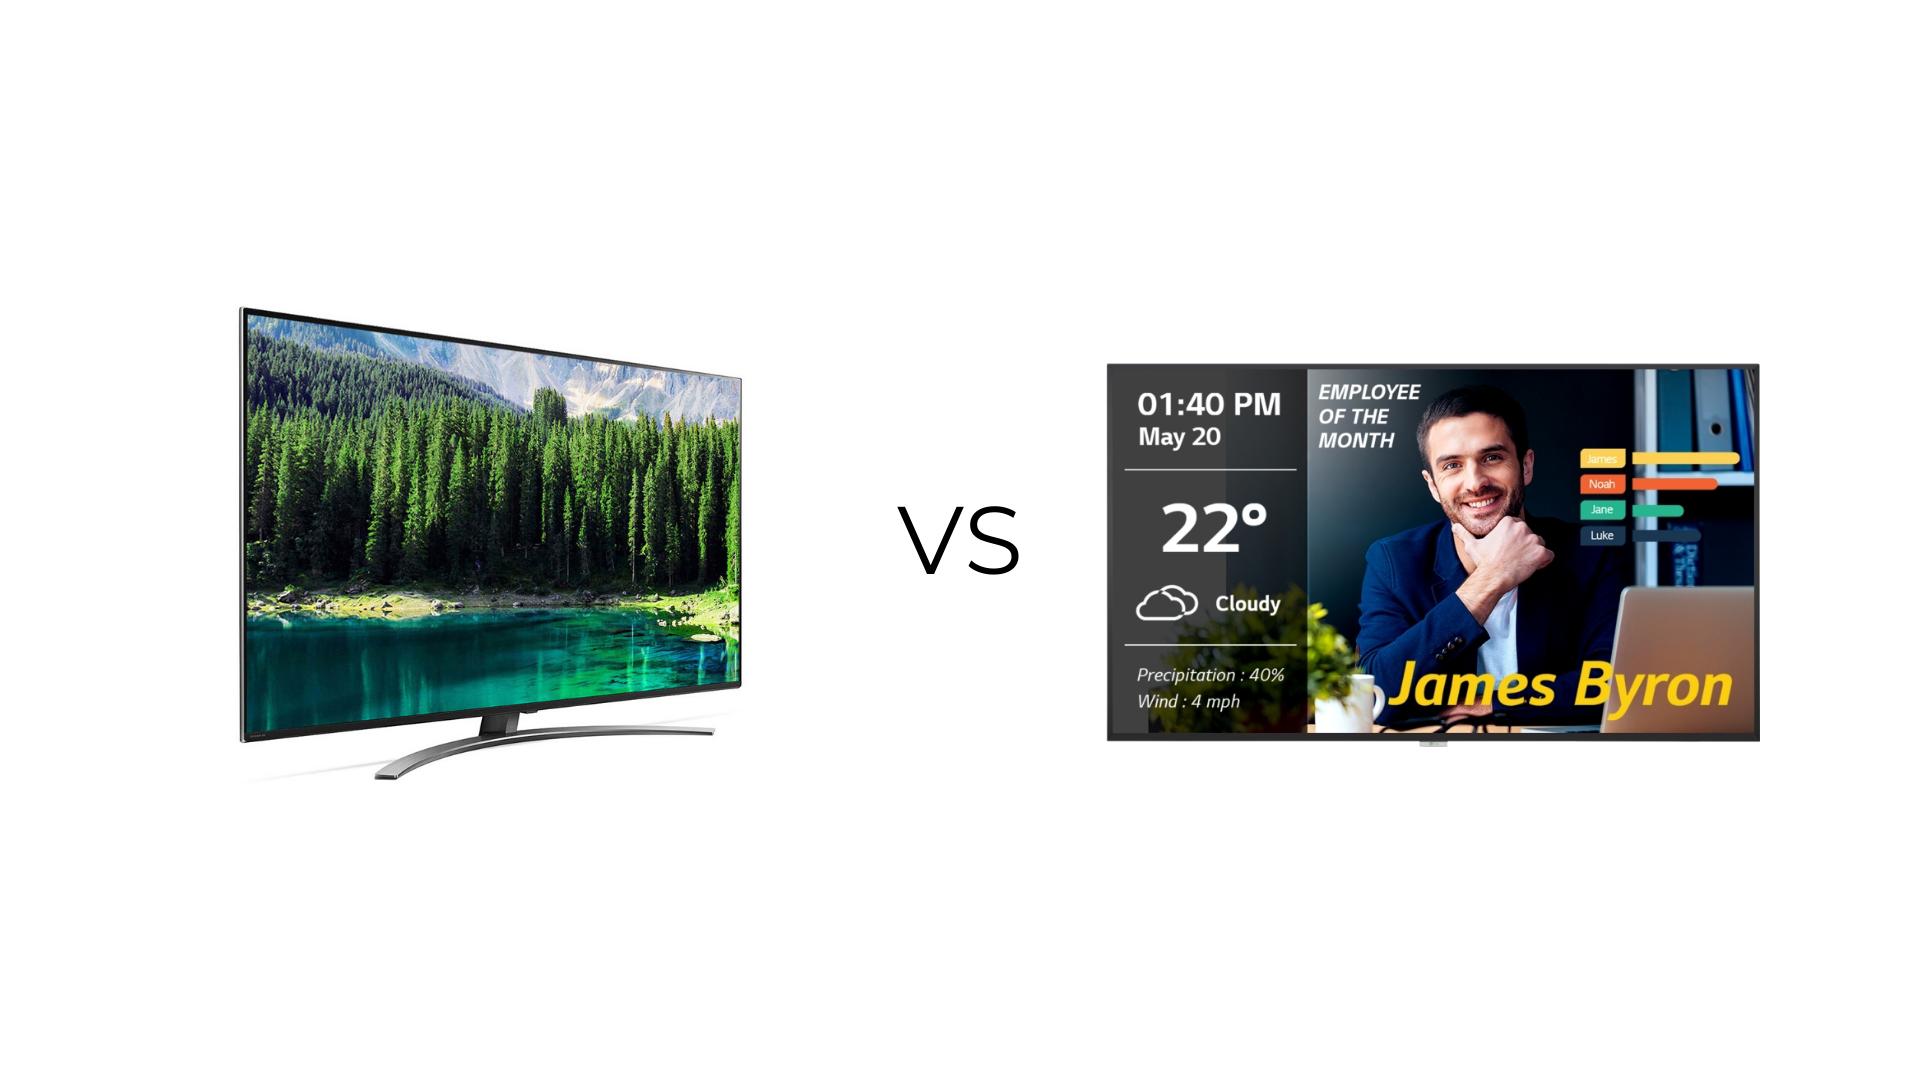 consumer vs commercial display ose8tz8pd7cnvz6p7vw2y9kkdfxu43ve4wtny2hank - Why Choose Commercial TV Display